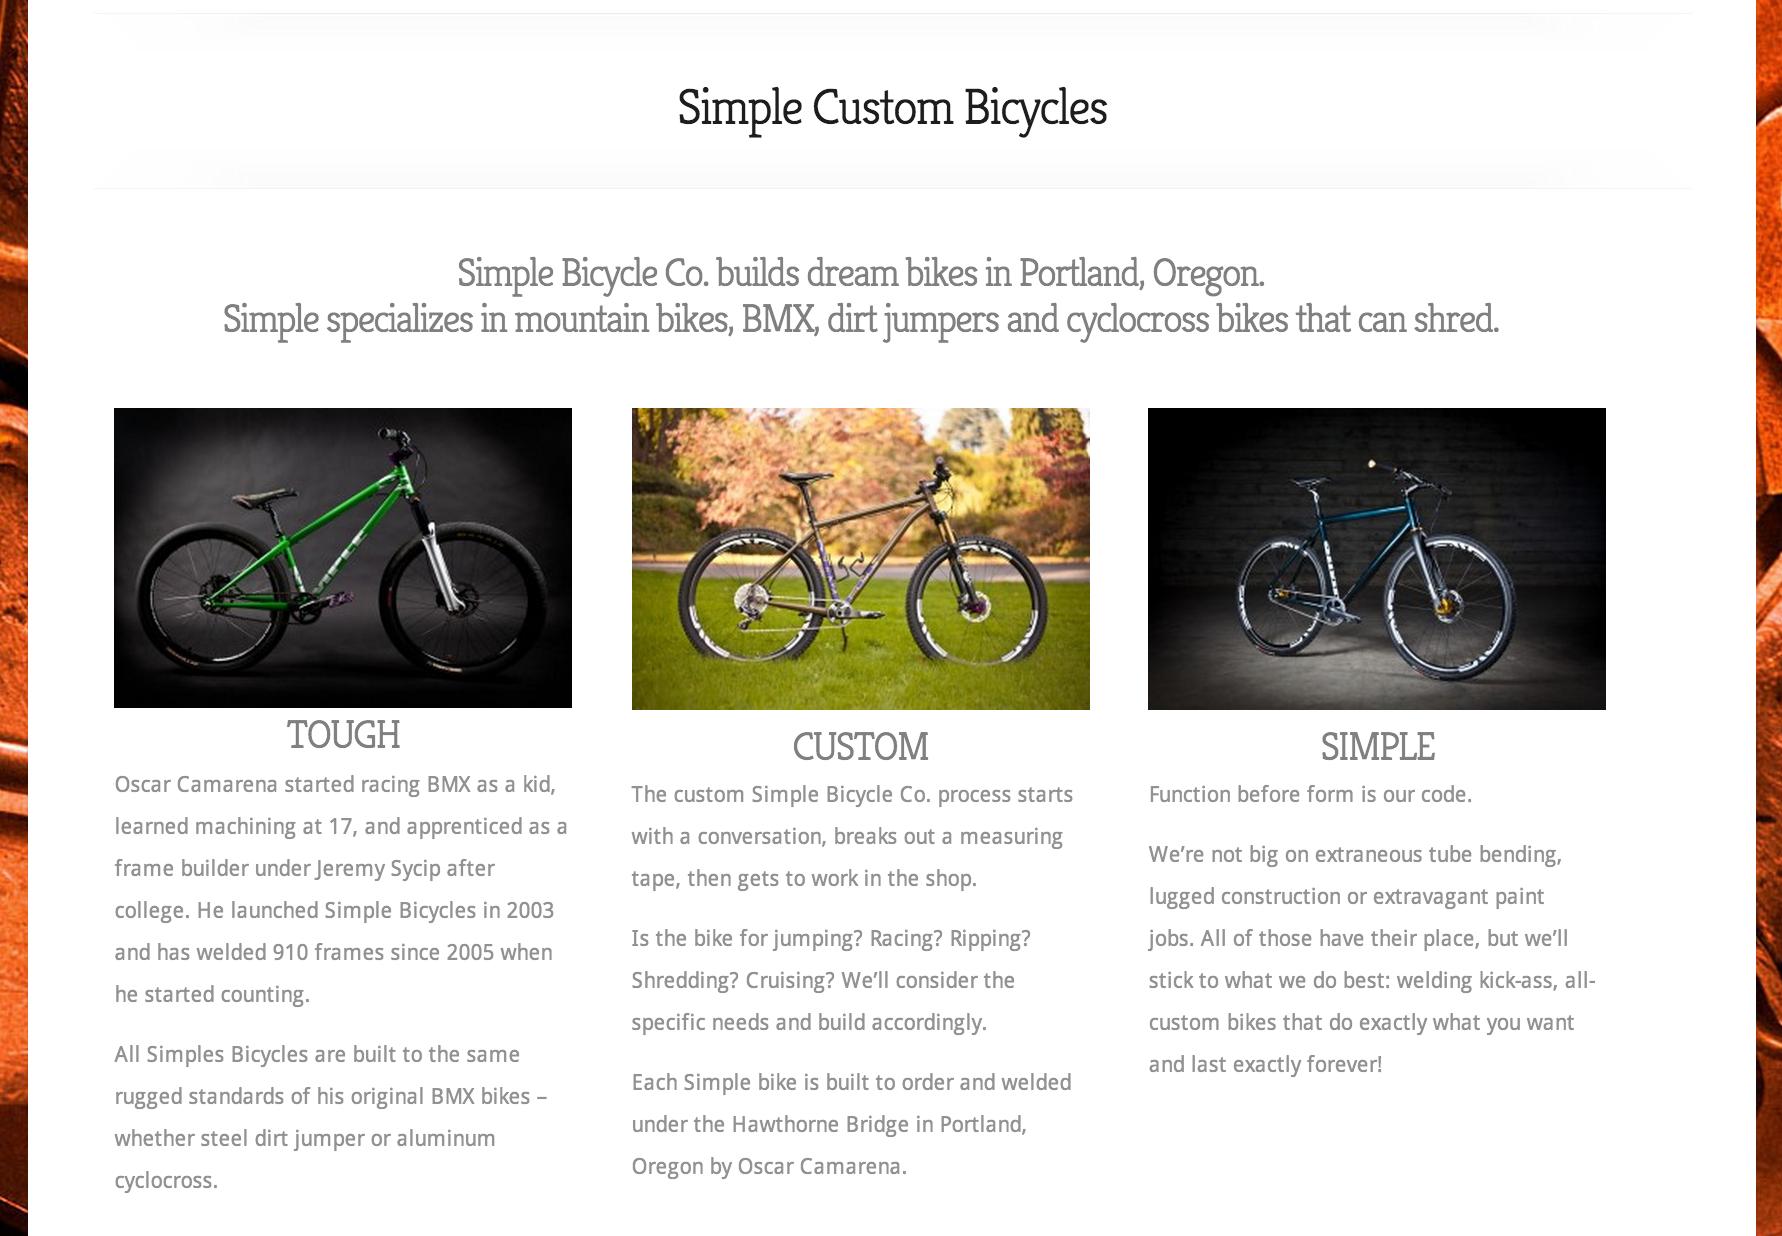 Simple Custom Bicycles